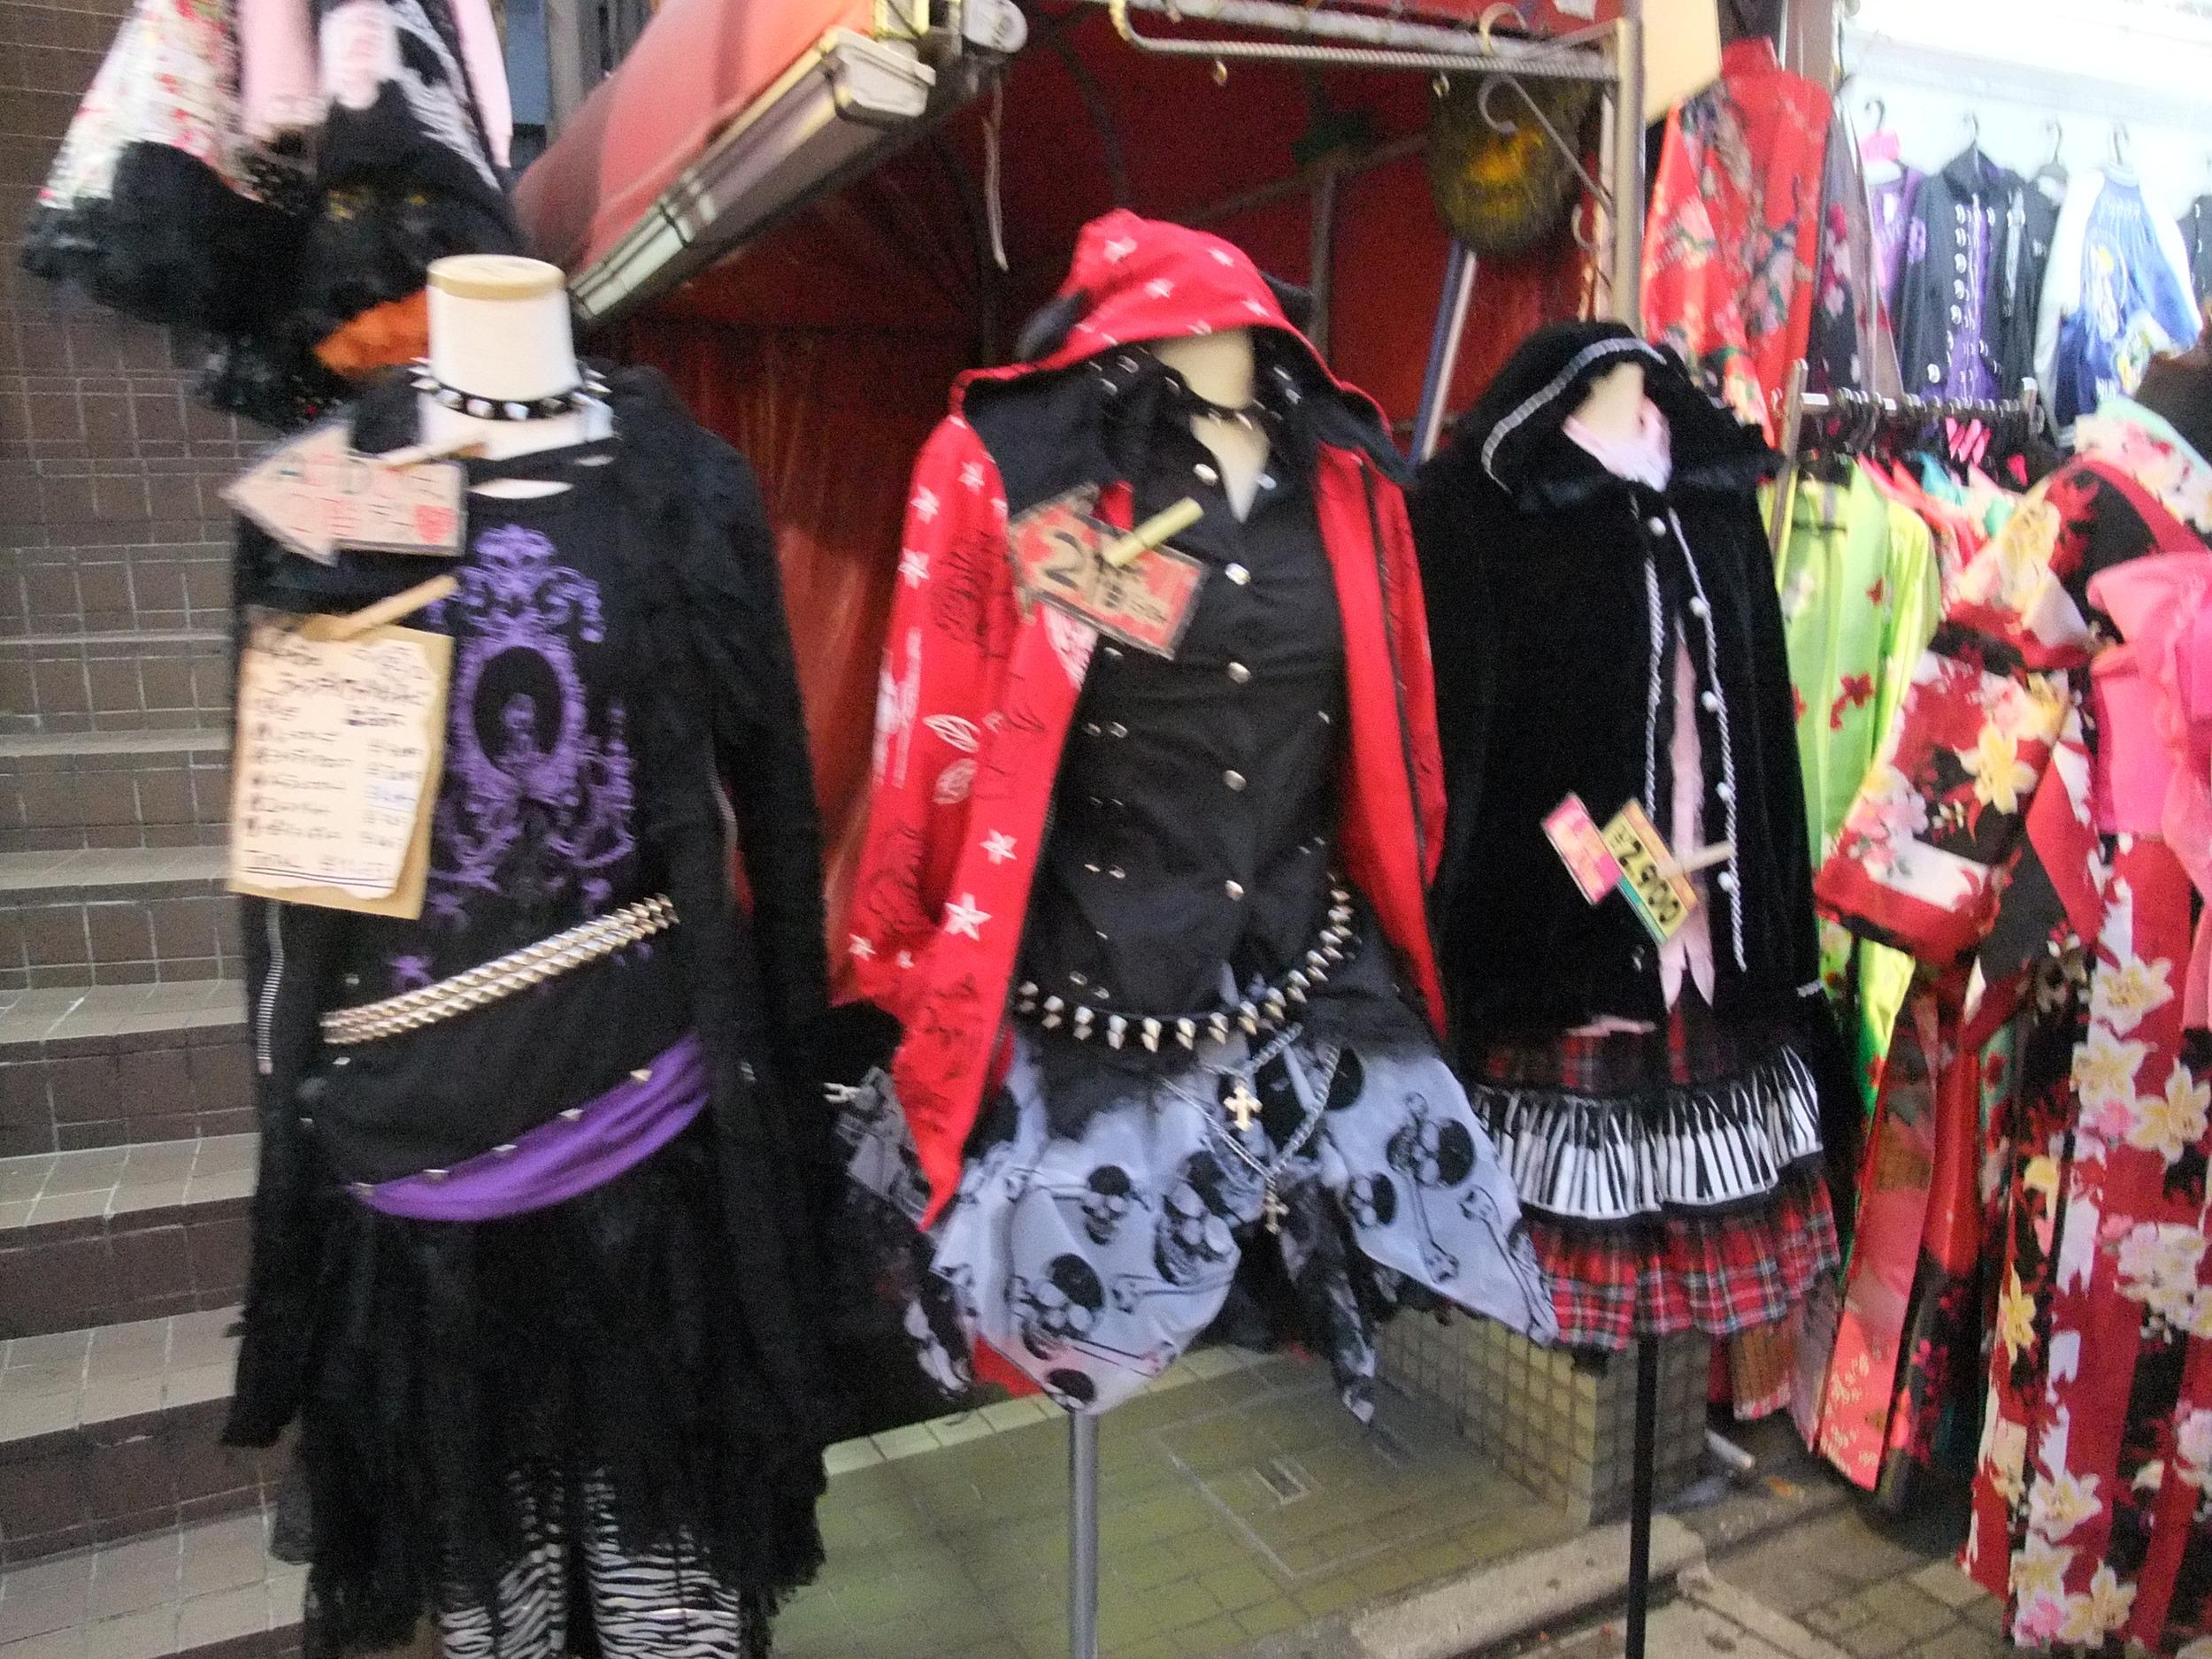 Punk Lolita outfits for sale on Takeshita Street